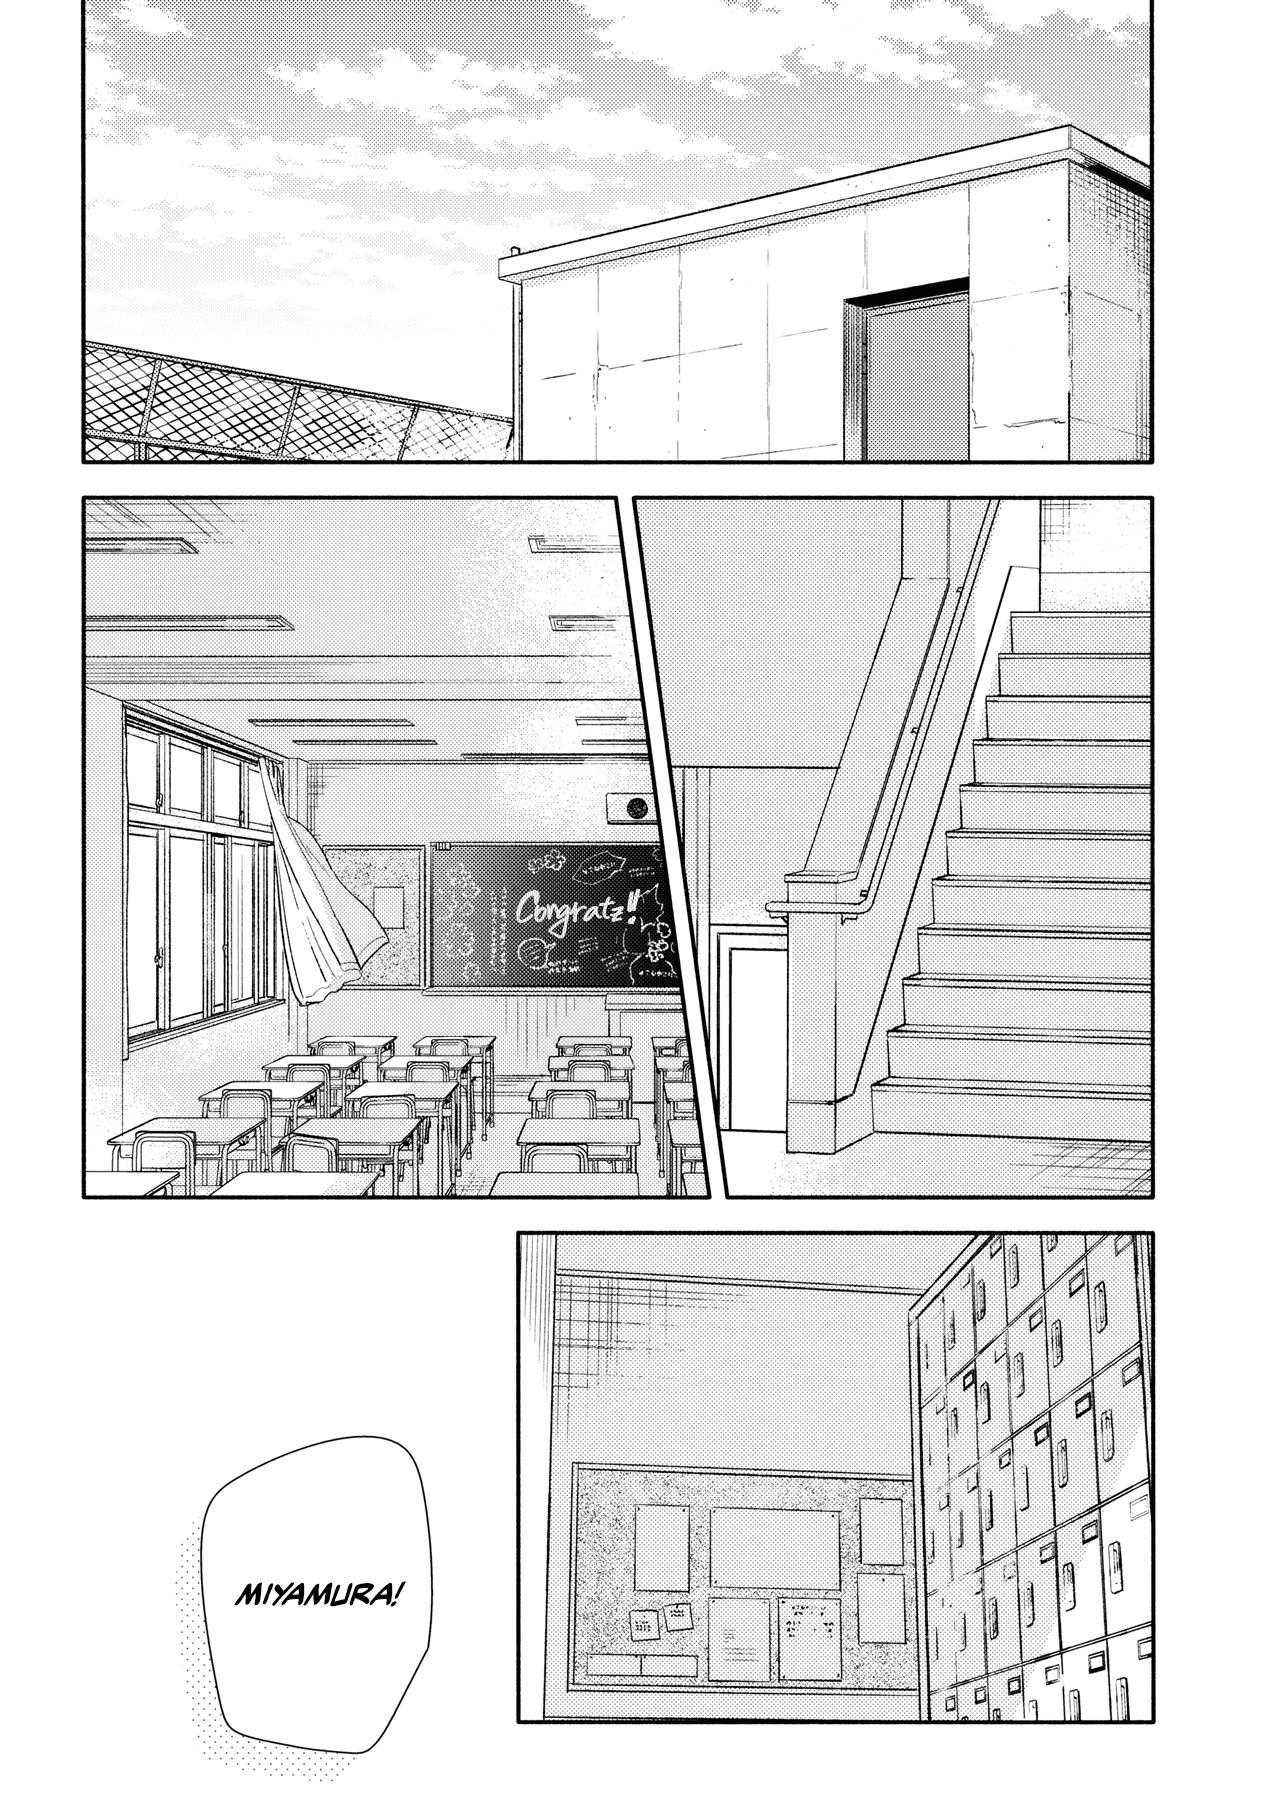 Horimiya, Chapter 125 Page 32